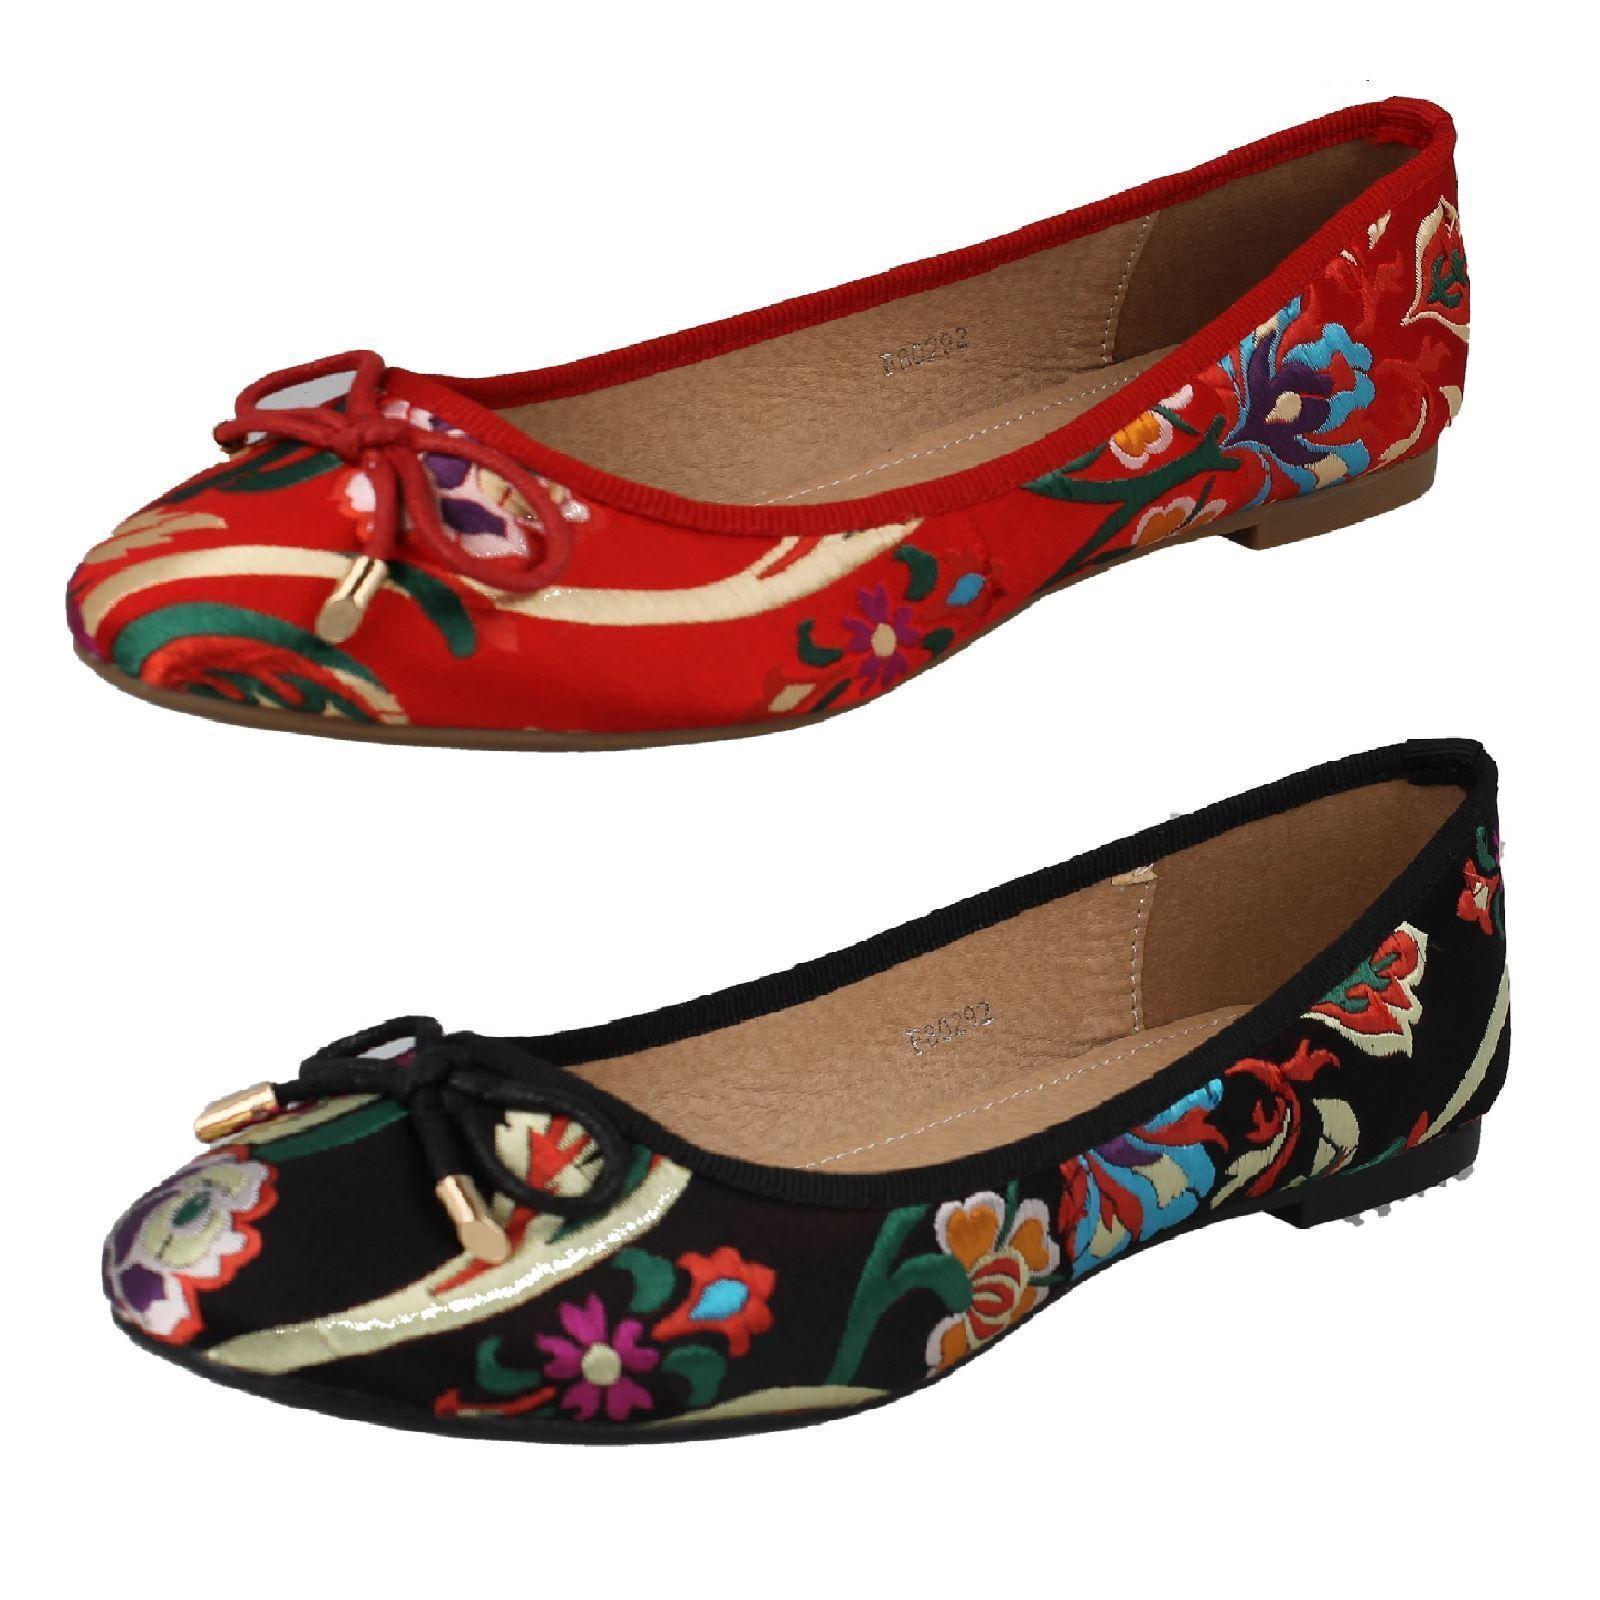 Spot  On f8r864 Mujer Tostado  Zapatos  Spot Bailarinas GB 3A 8 (r41a) J-K b9b13d